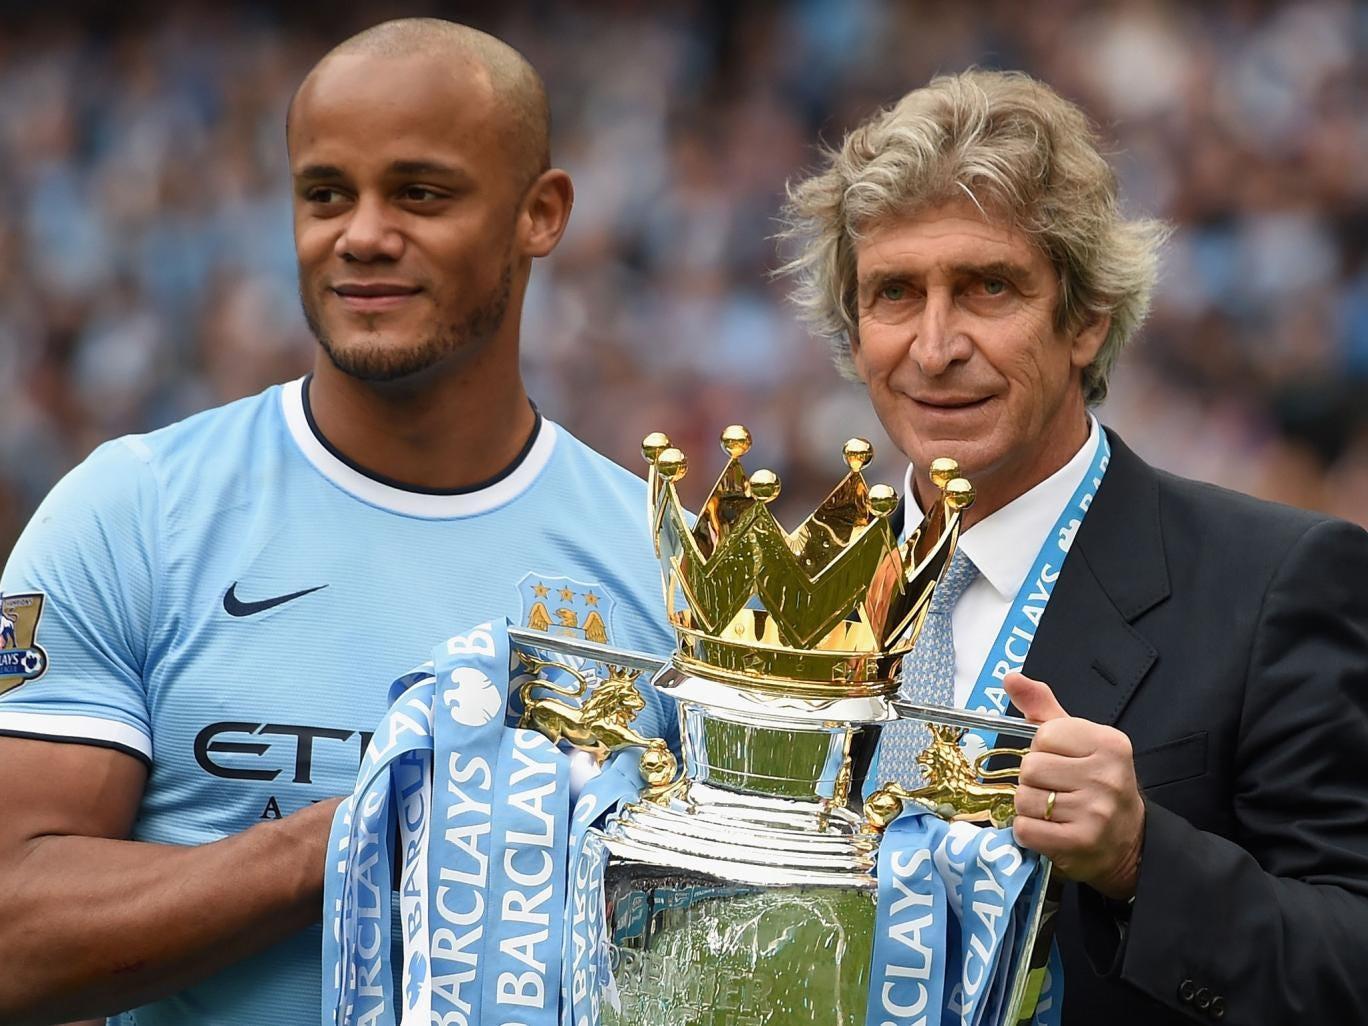 Manchester City manager Manuel Pellegrini holds the Premier League trophy with captain Vincent Kompany